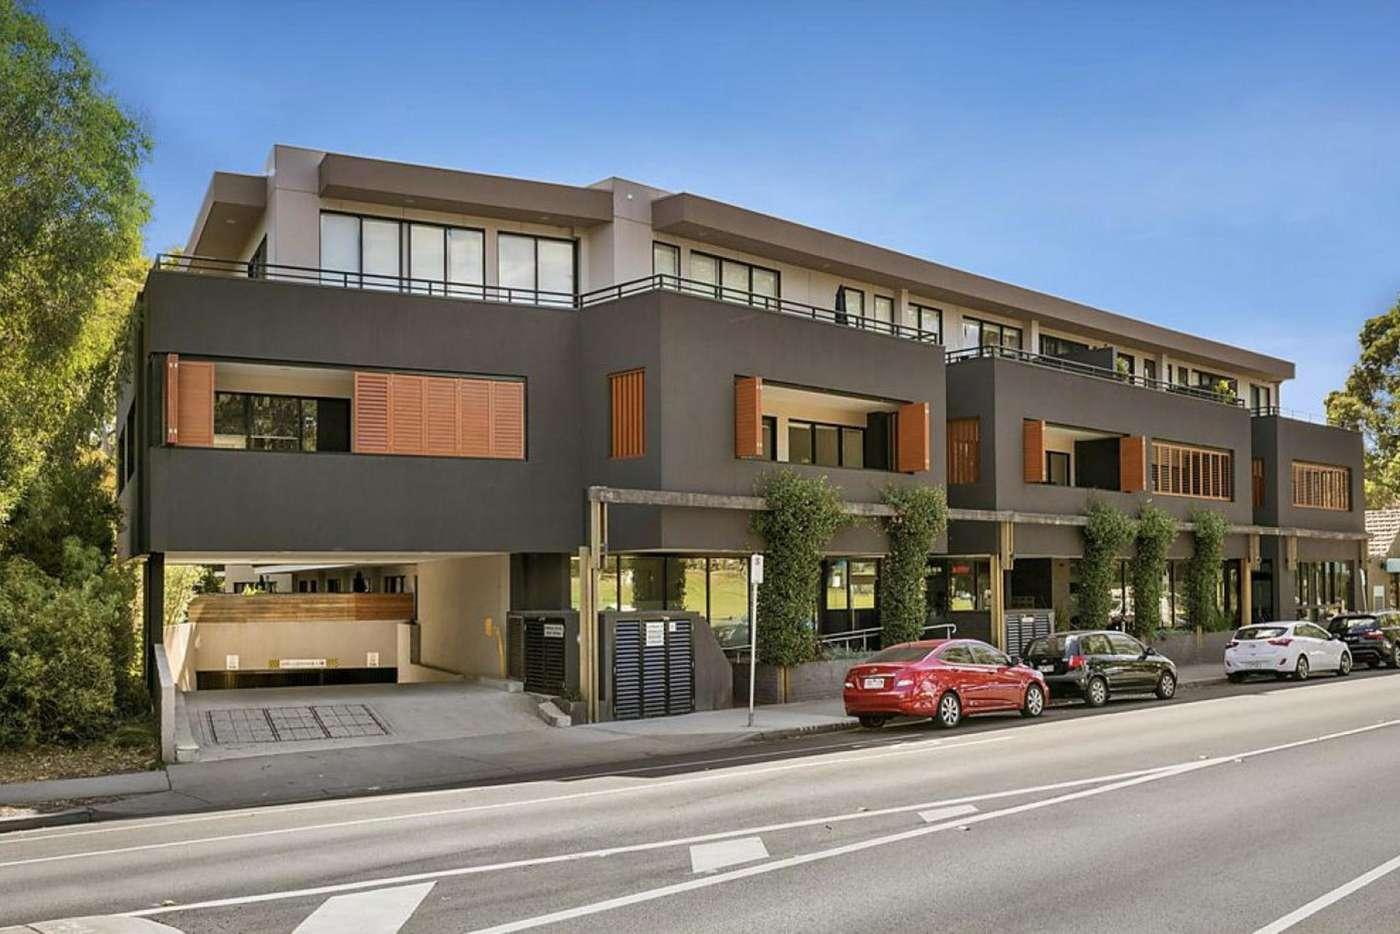 Main view of Homely apartment listing, 107/108 Glen Iris Road, Glen Iris VIC 3146